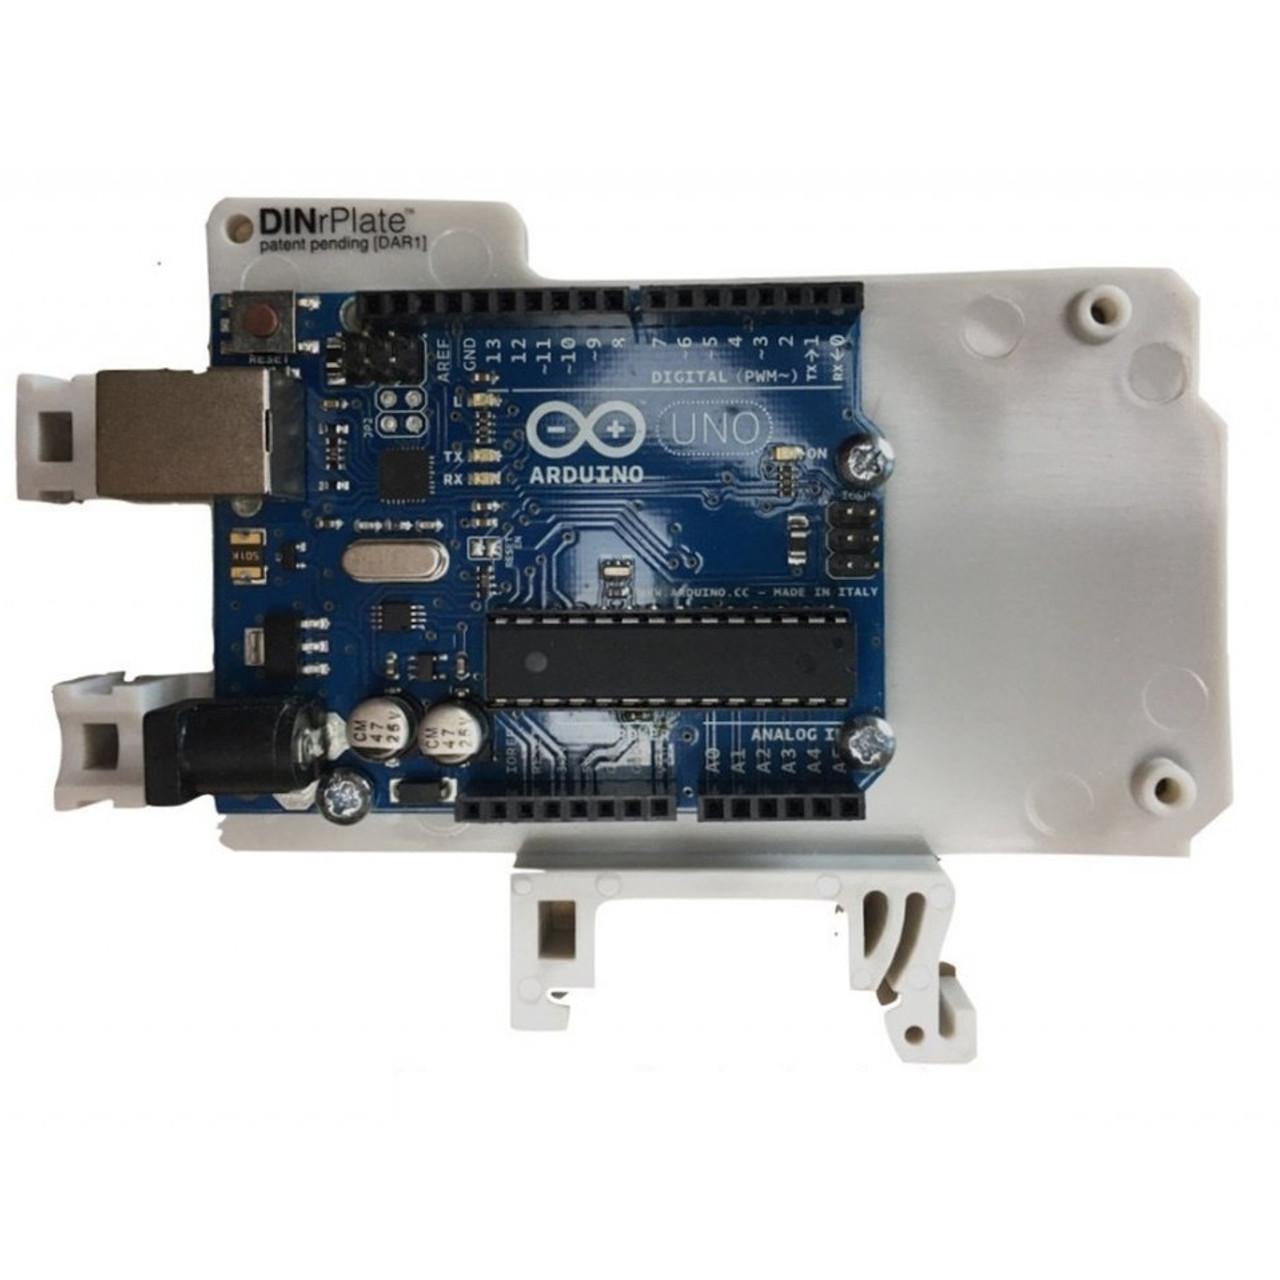 DINrPlate - DIN Rail Mount for Arduino Uno/Mega